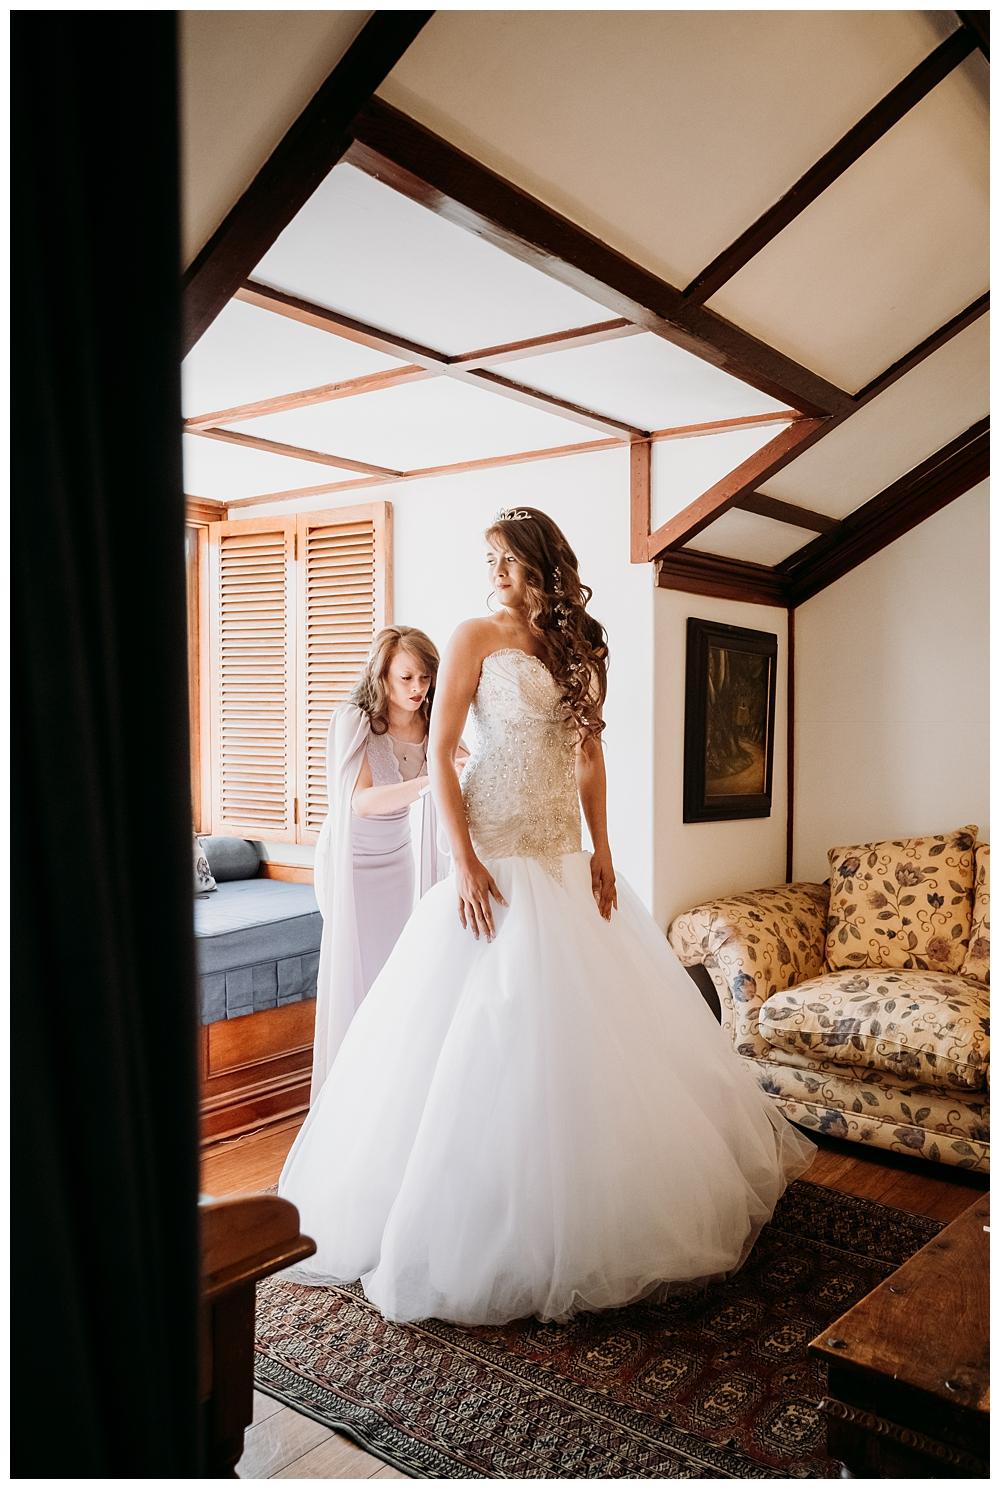 Best_Wedding_Photographer_AlexanderSmith_1780.jpg